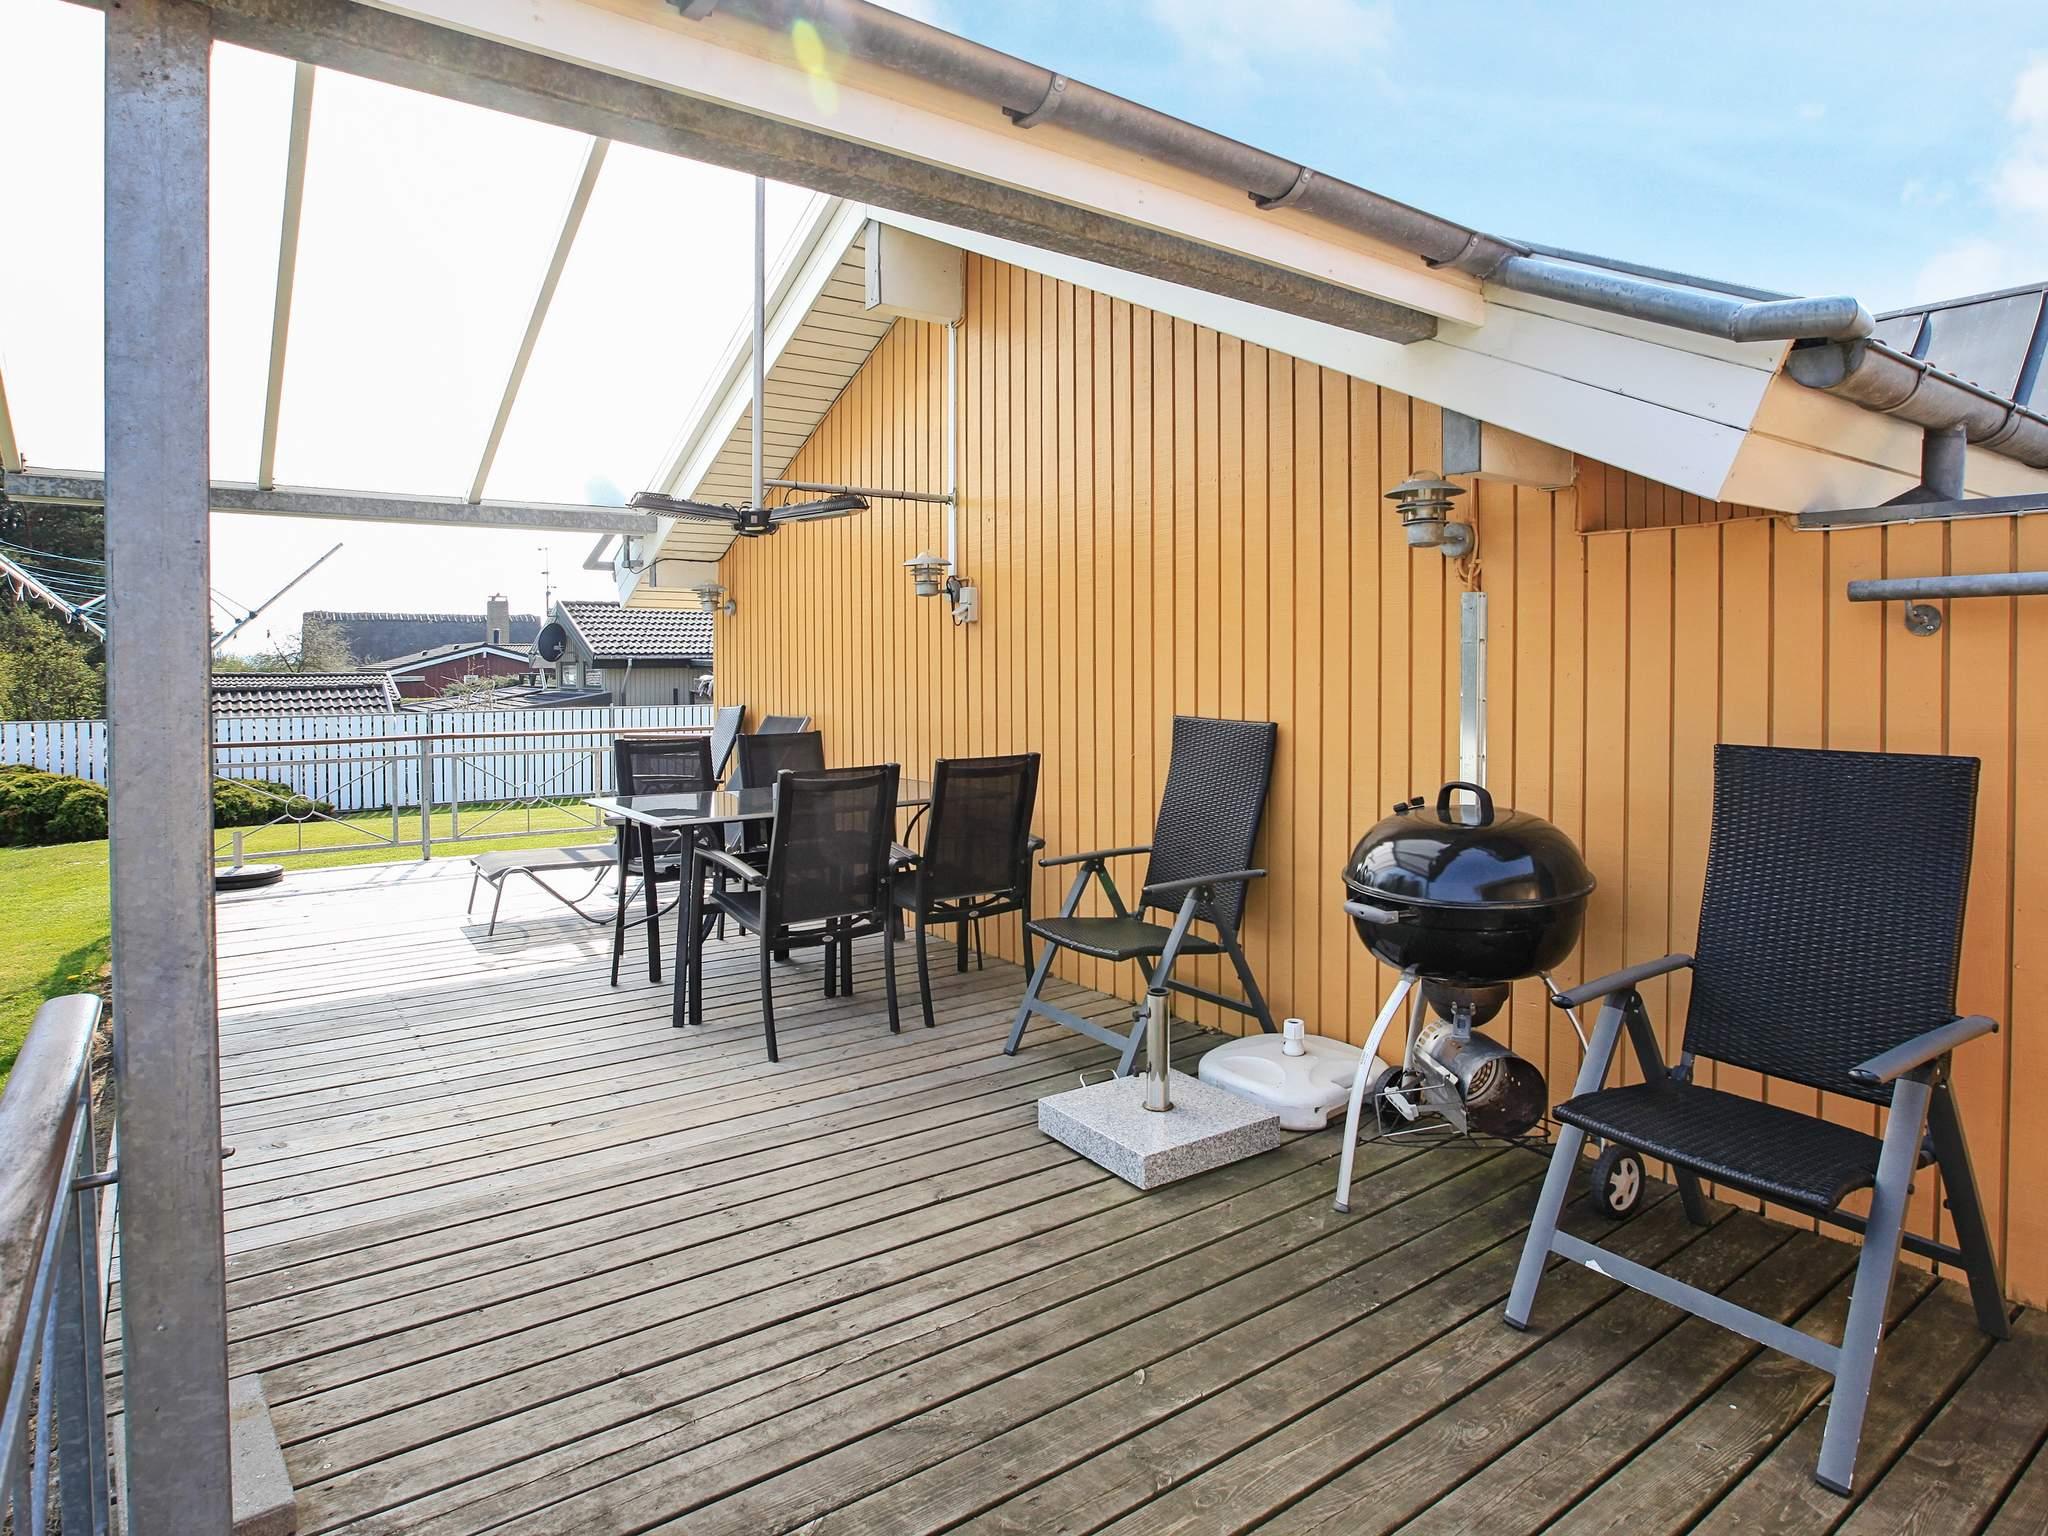 Maison de vacances Falsled (87545), Faldsled, , Fionie, Danemark, image 29